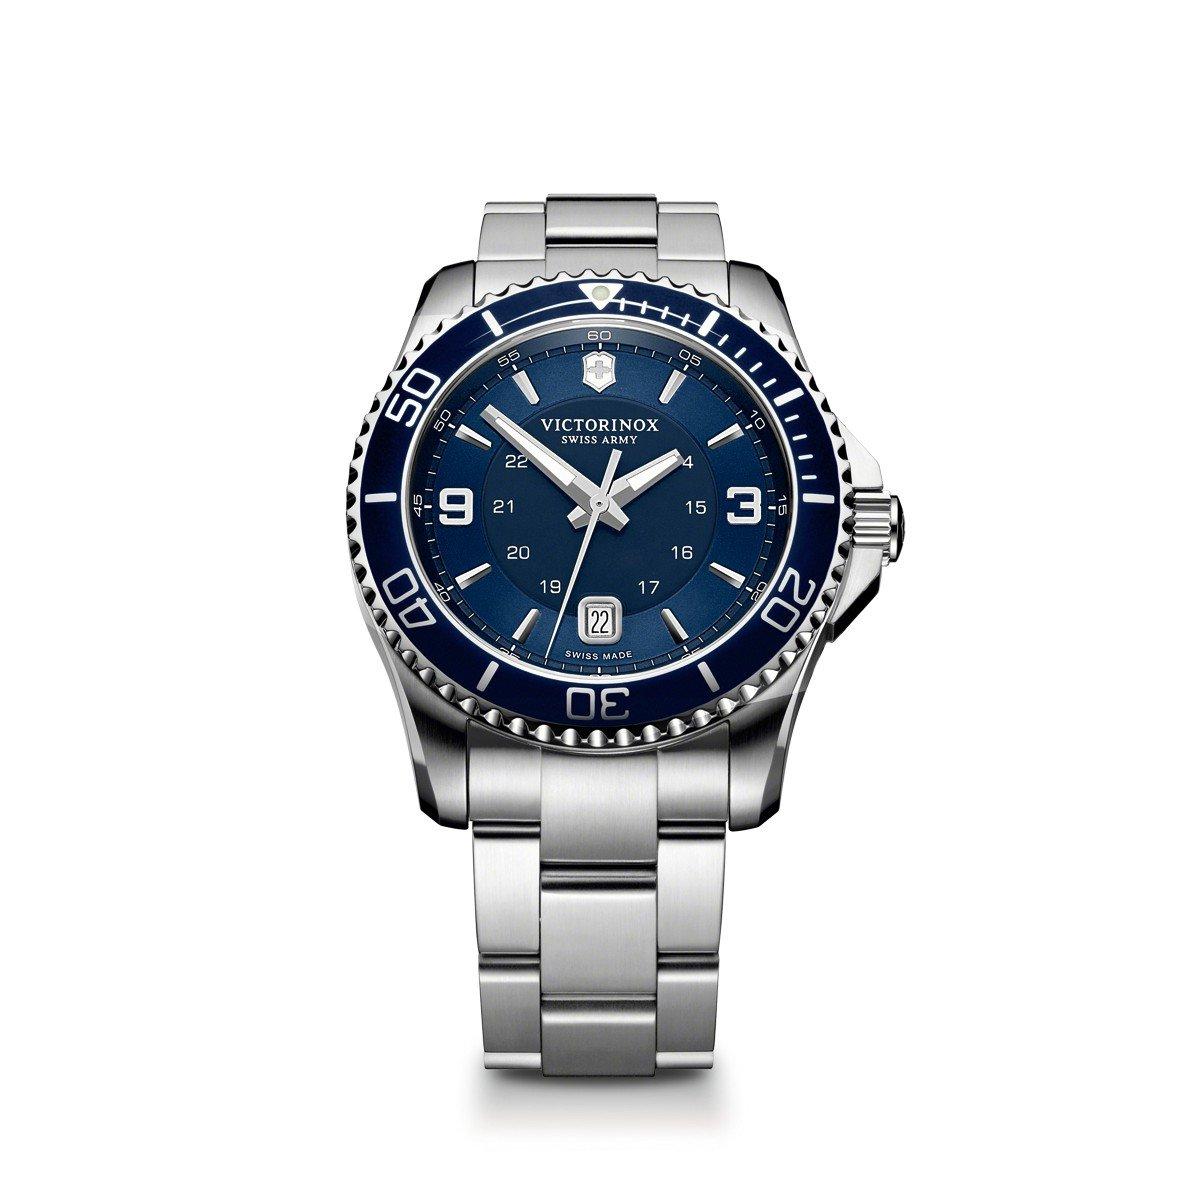 Victorinox Swiss Army Maverick Stainless Steel Watch, 34mm, Black